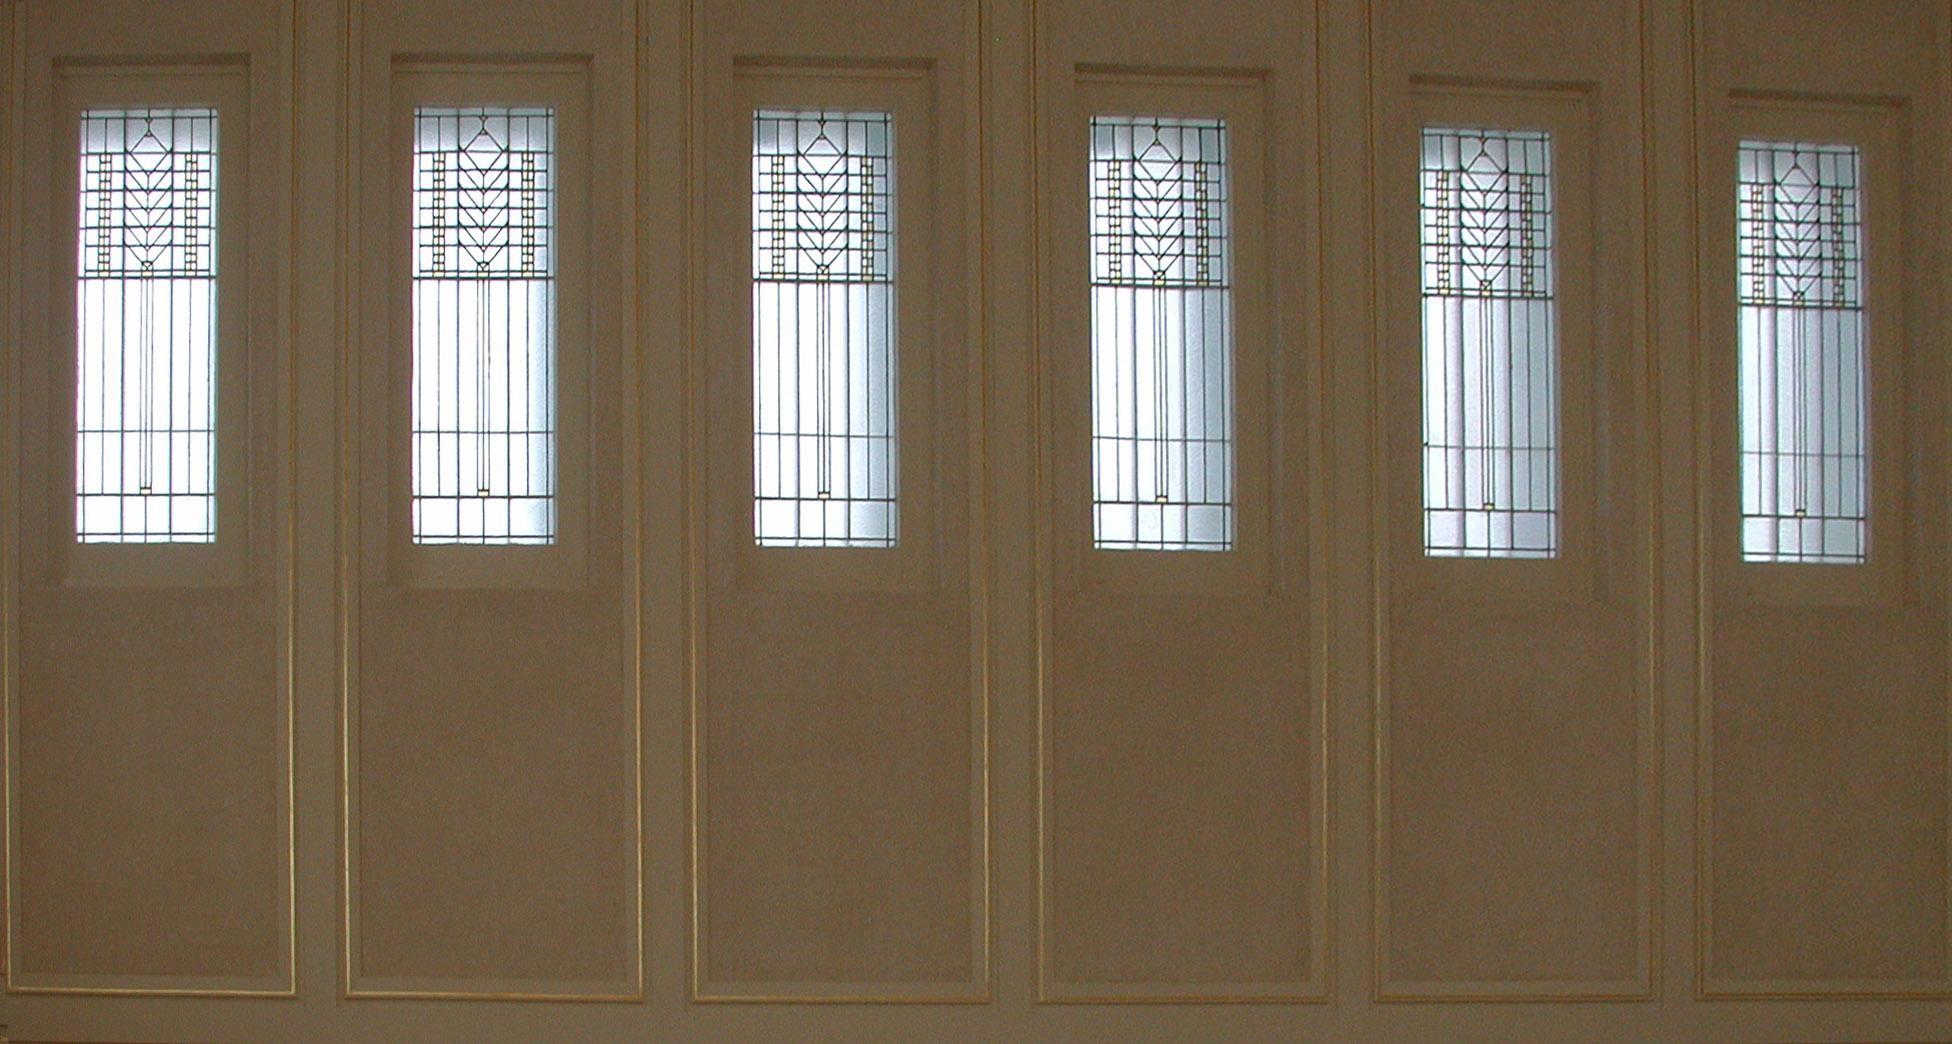 Holdman_Studios_Stained_Art_Glass_LDS_Mormon_Temple_Laie_Hawaii_Windows.jpg